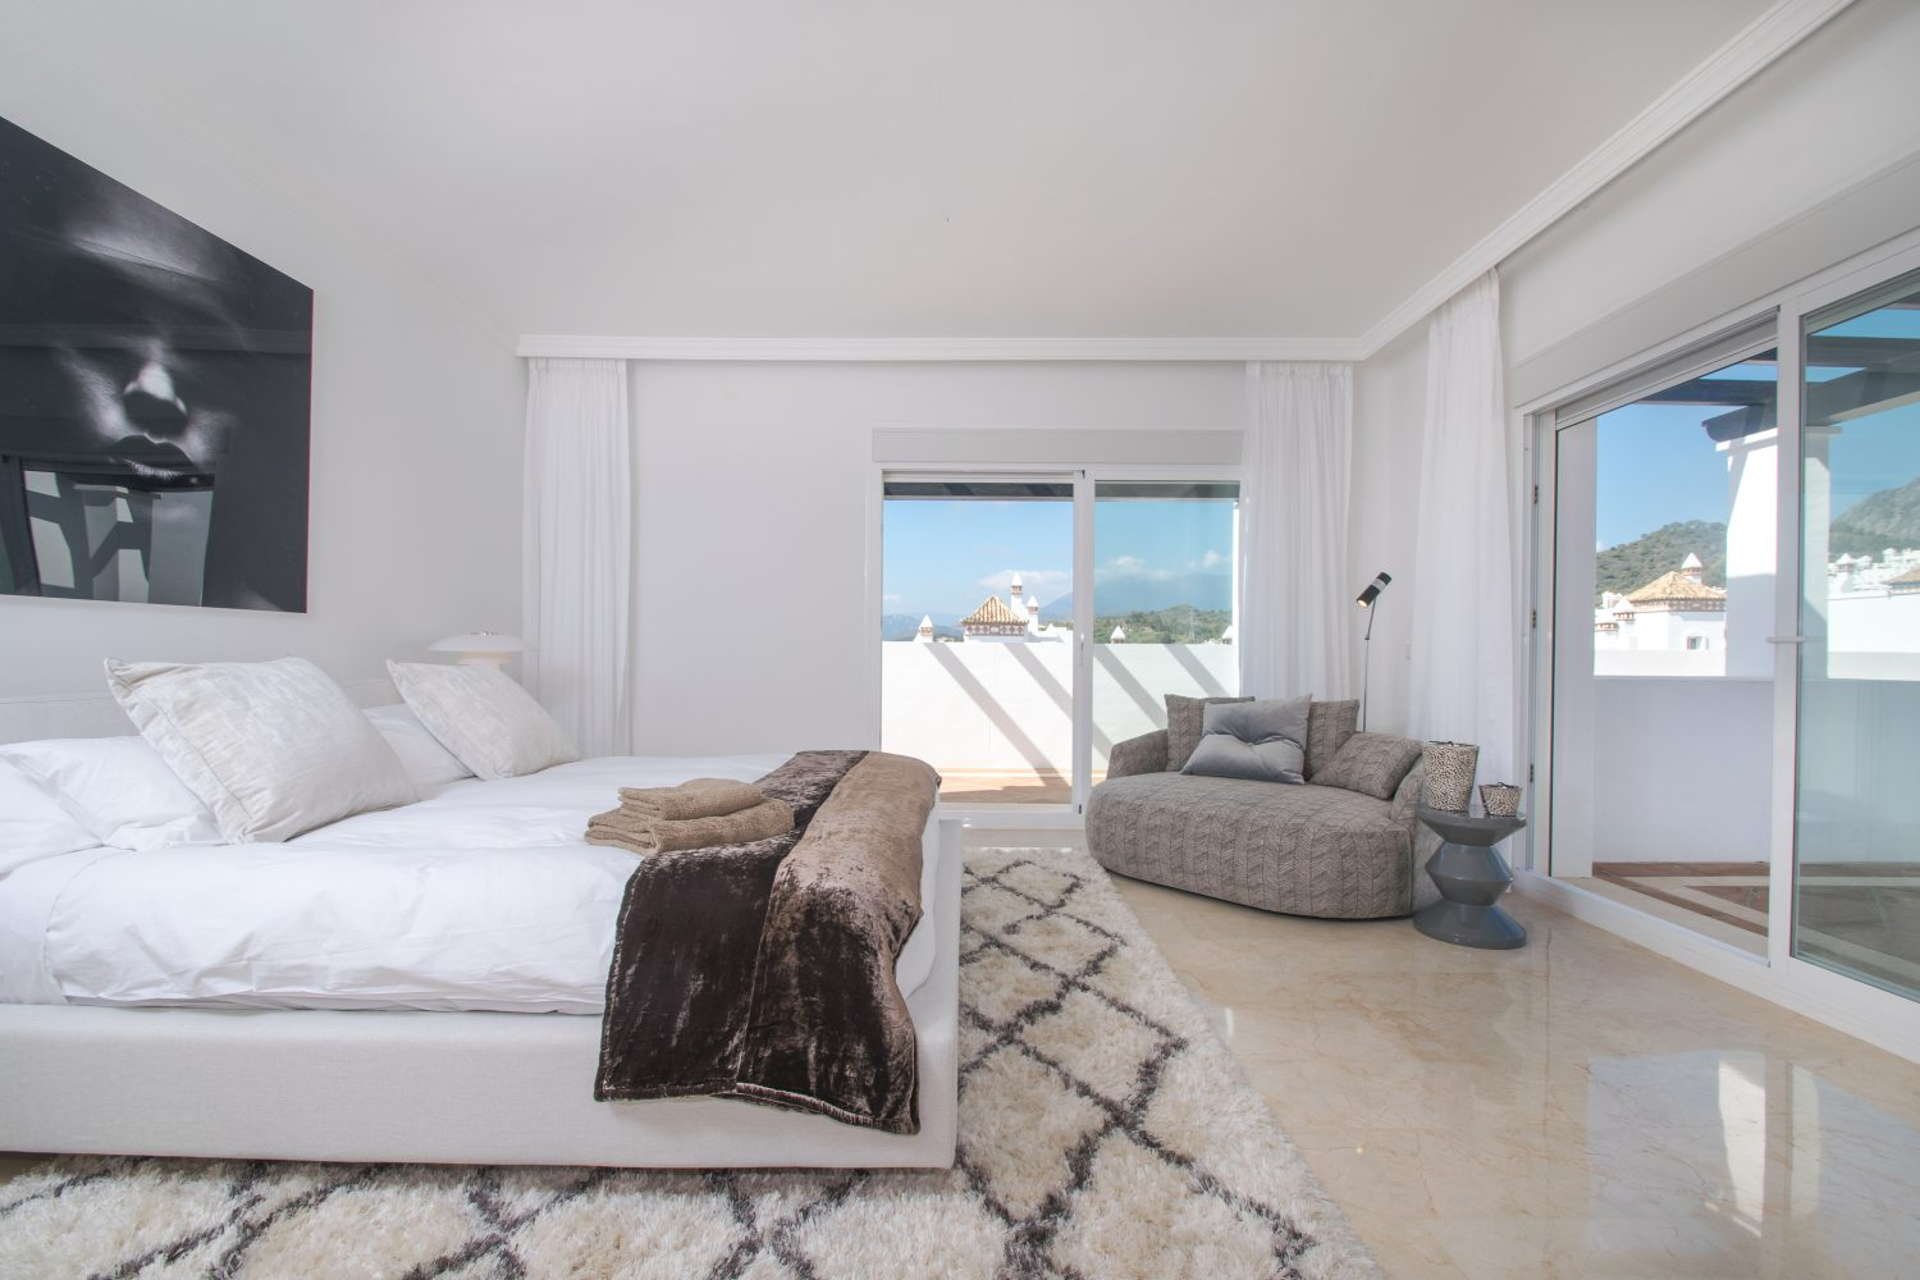 Refurbished 2 Bedroom Apartment For Sale In Sierra Blanca Marbella Columbus Hills Realista